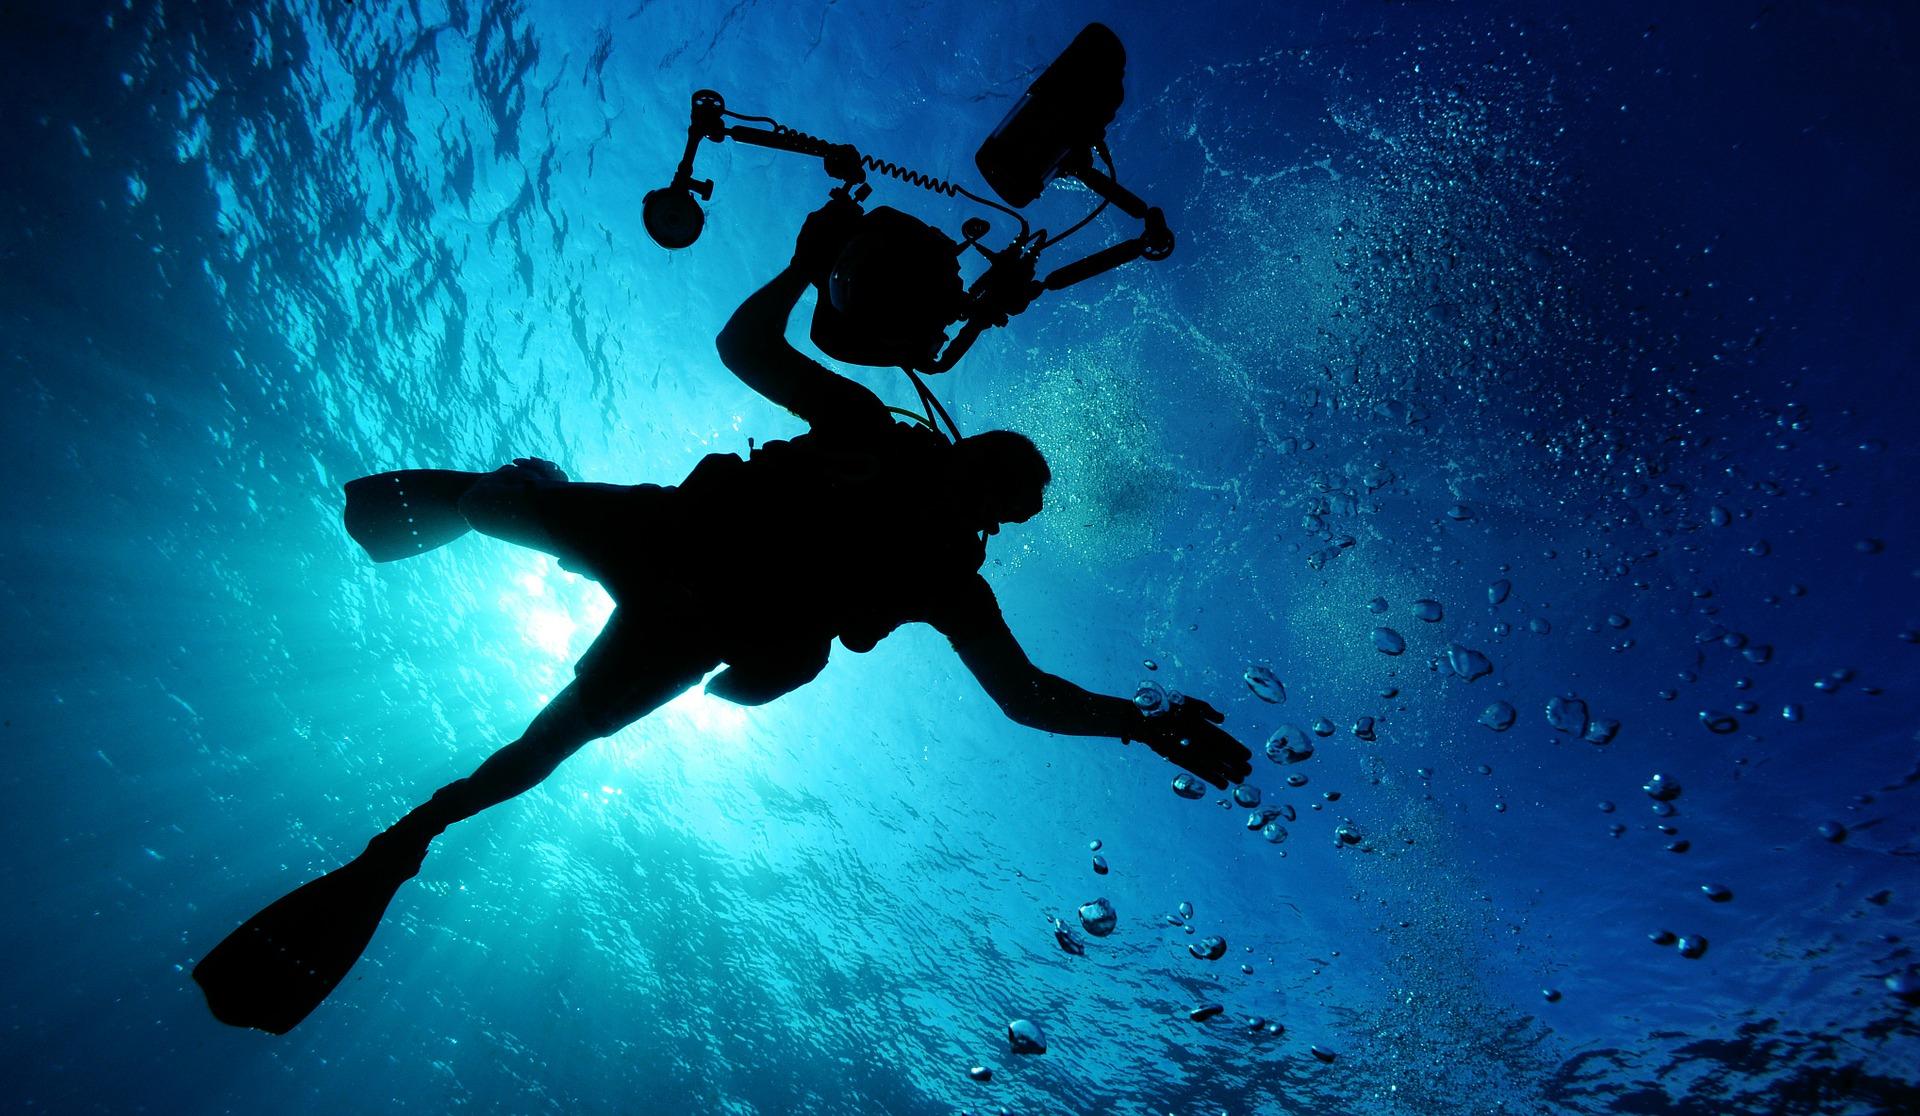 dykker set nedefra i havet